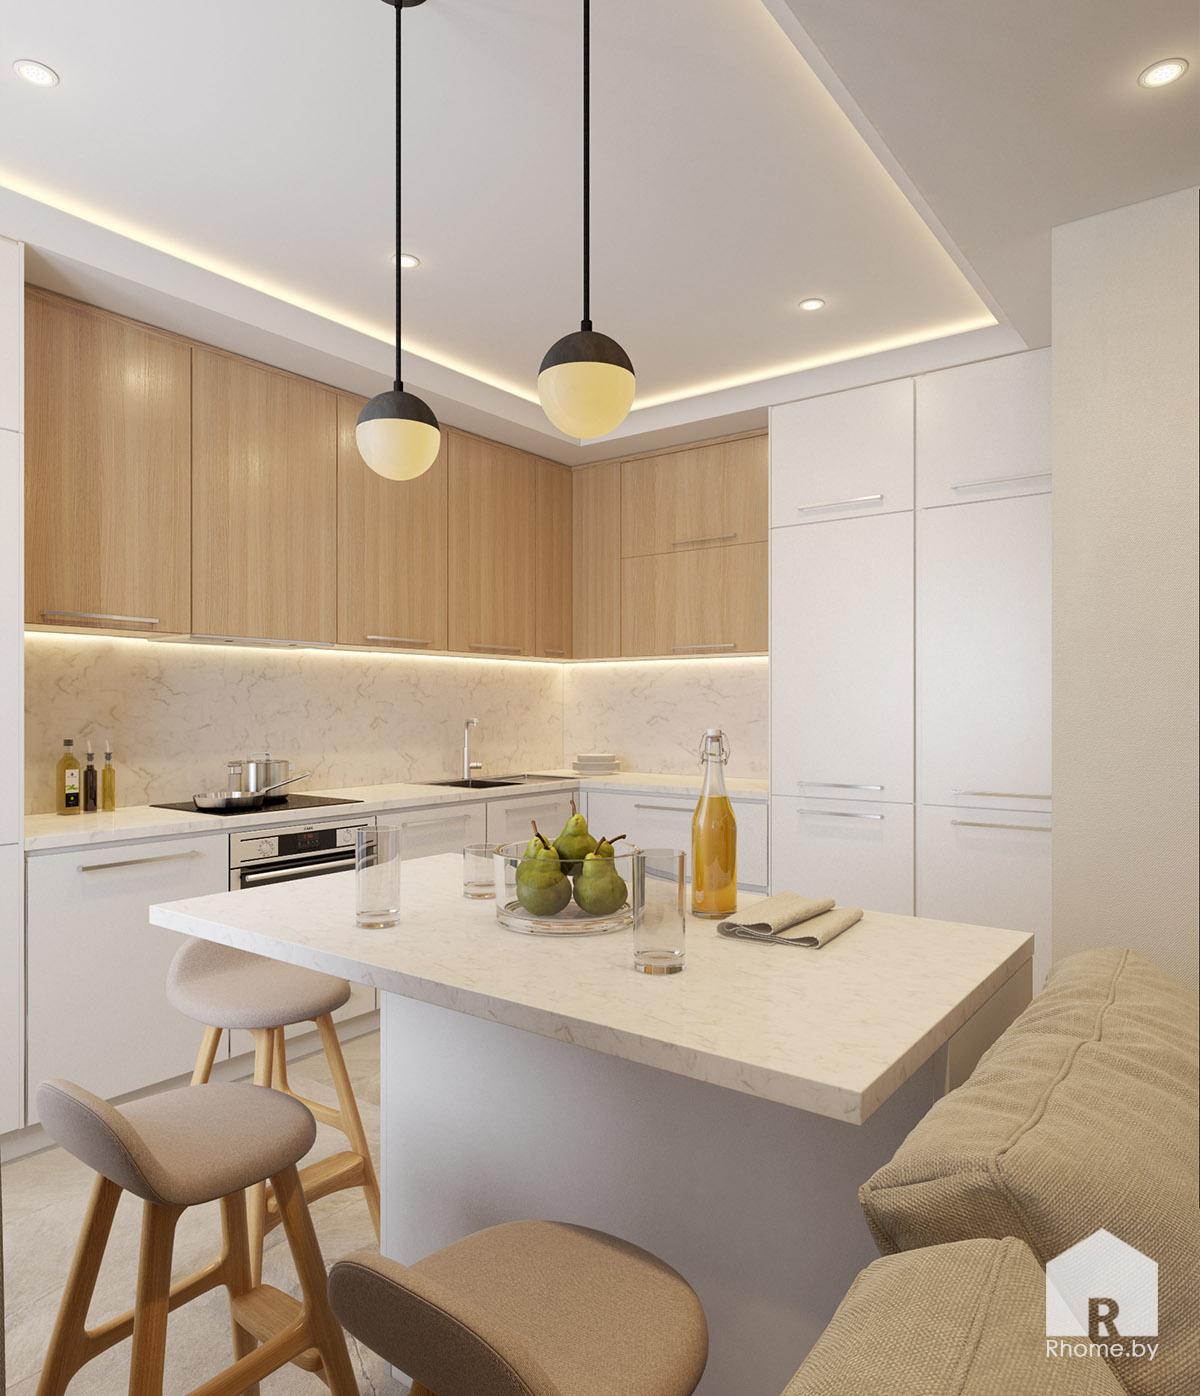 Дизайн кухни на ул. Беломорская | Дизайн студия – Rhome.by